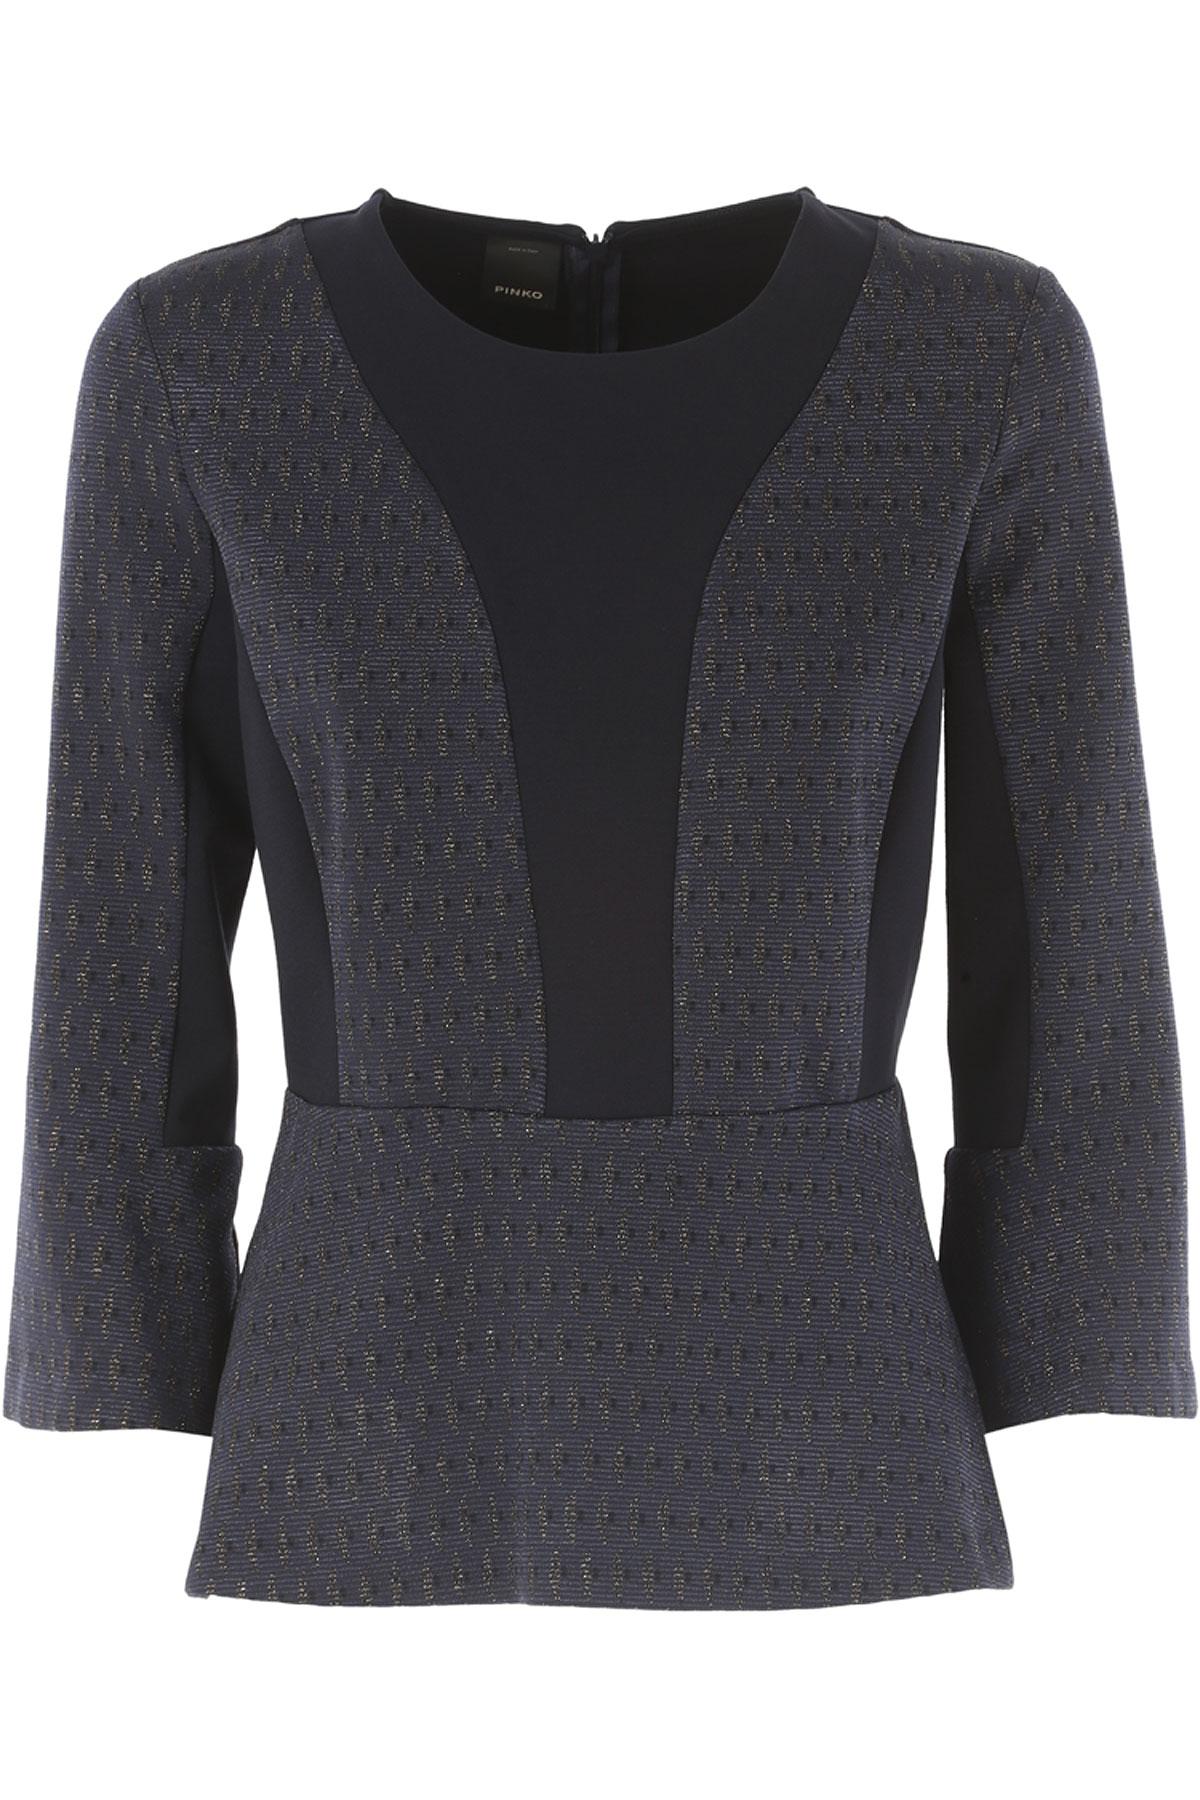 21d702e04a23ea Womens Clothing Pinko, Style code: duplicity-1b11ux6067-ez9